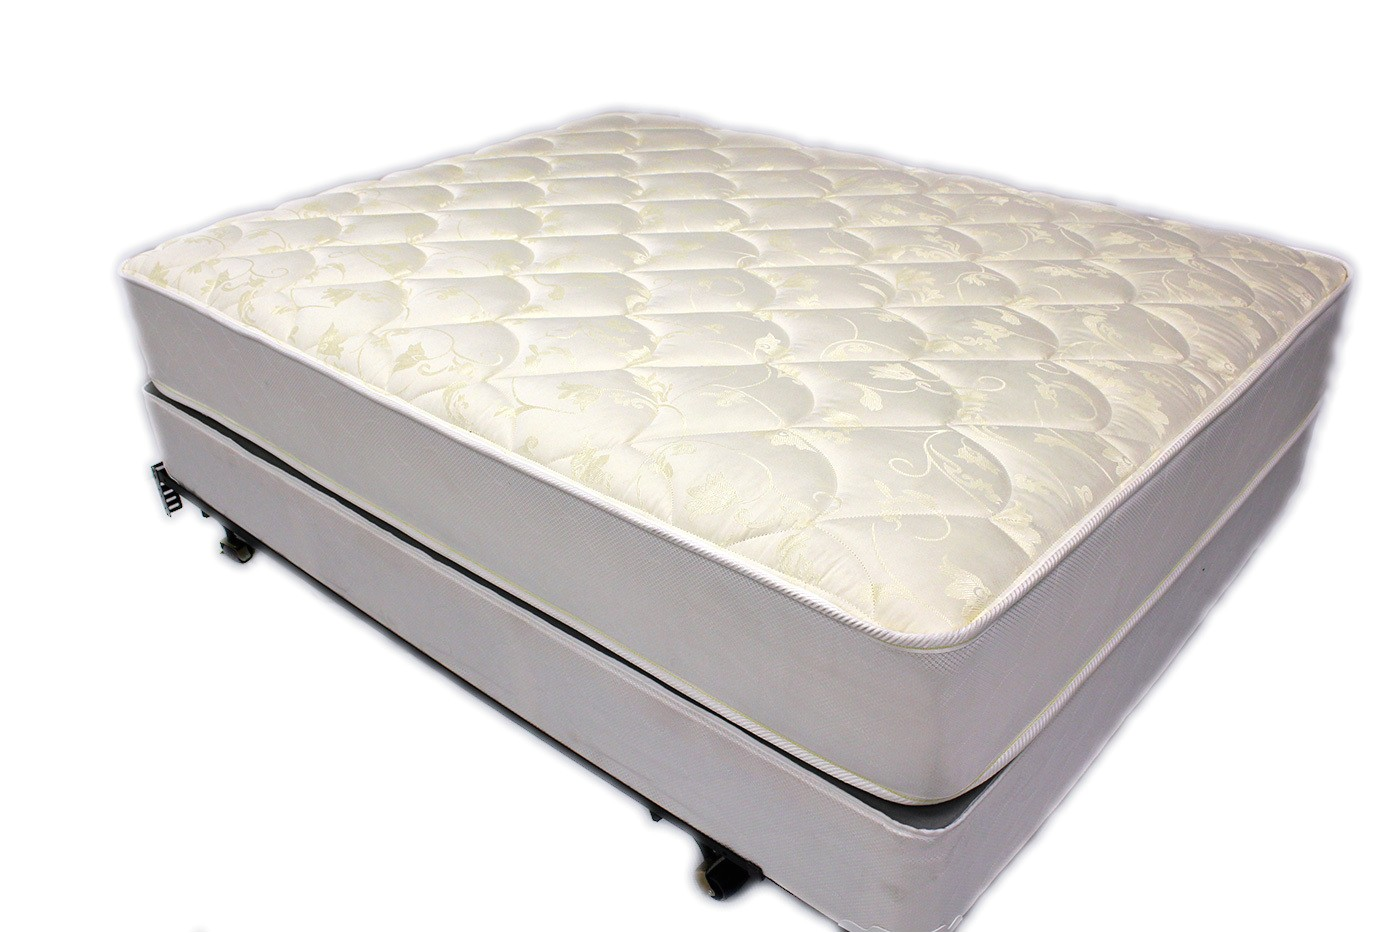 astounding full size mattress and box springs